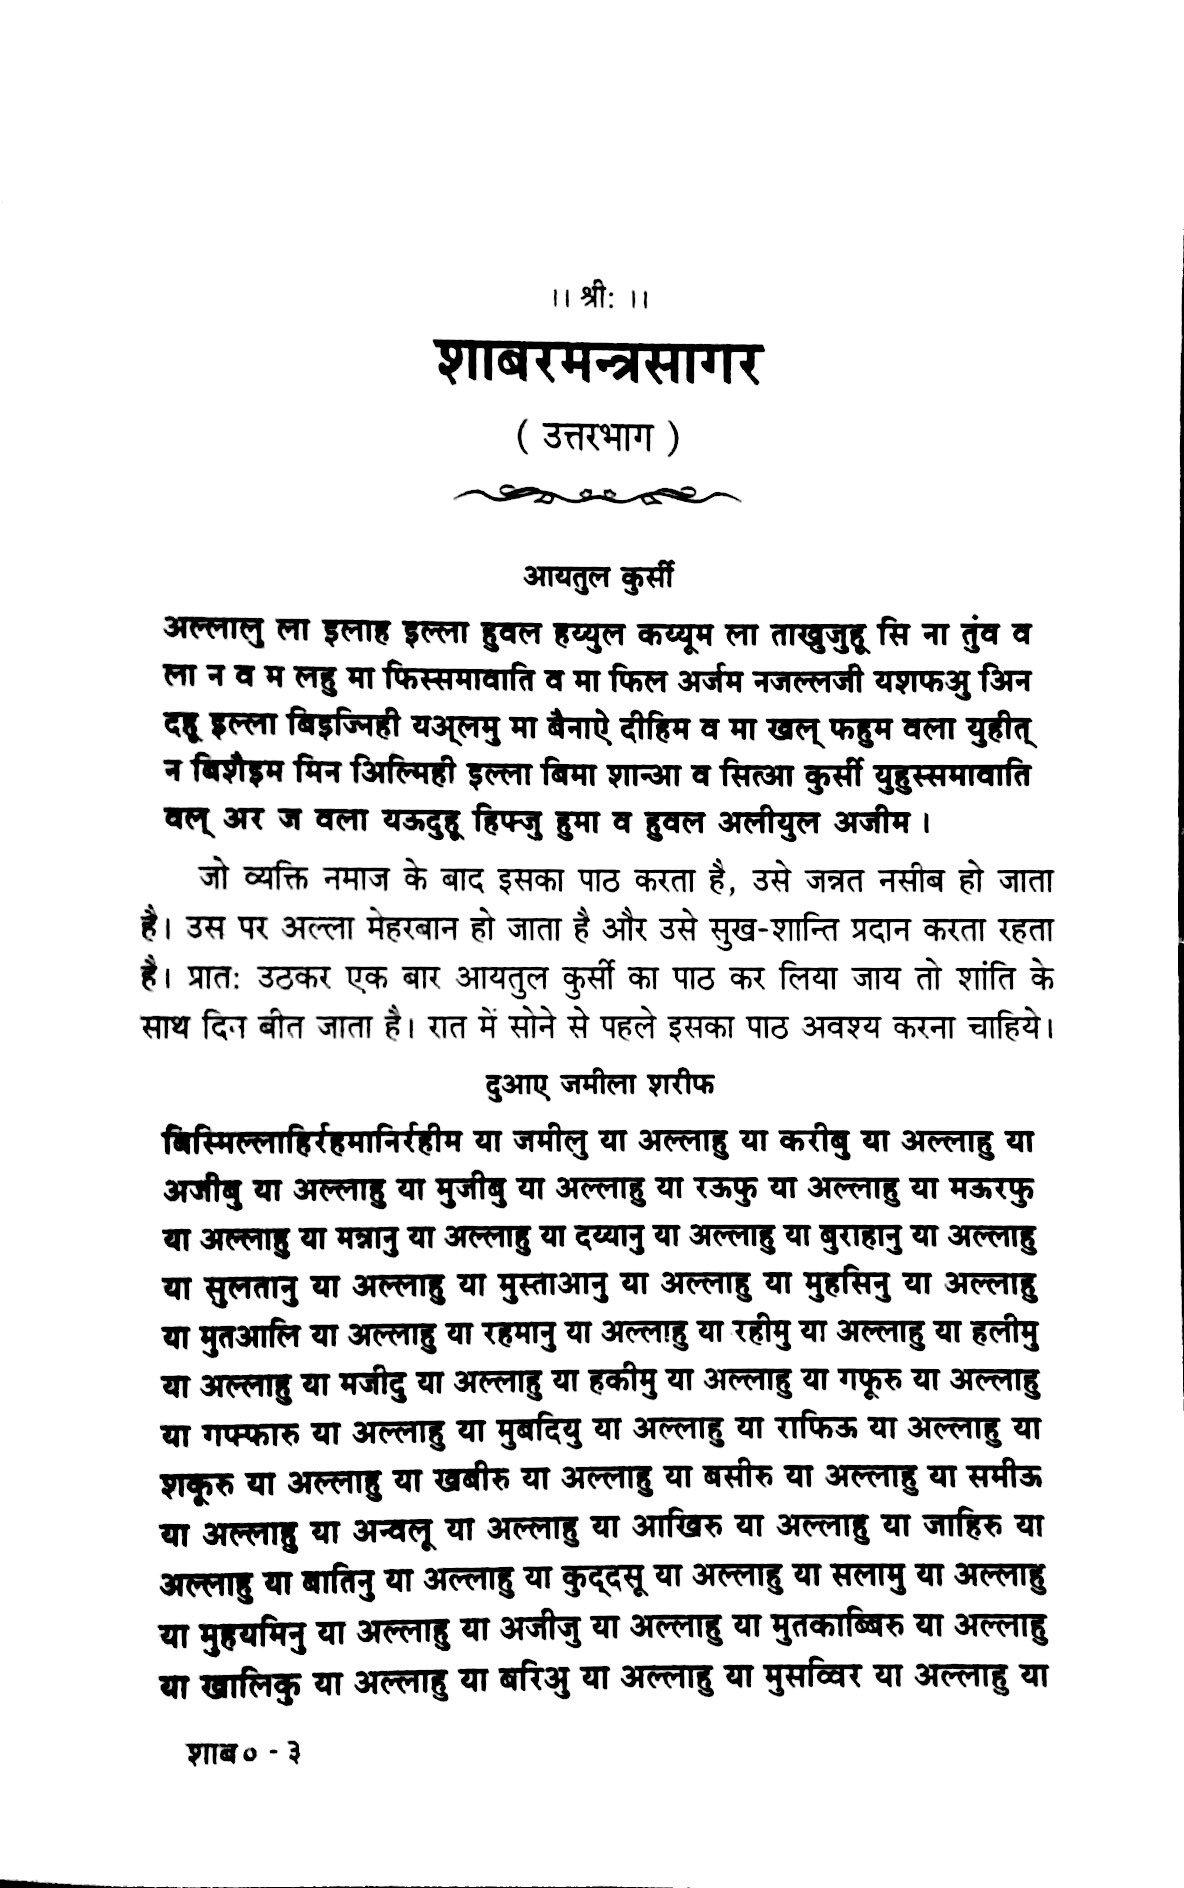 Shabar Mantra Ebook In Hindi